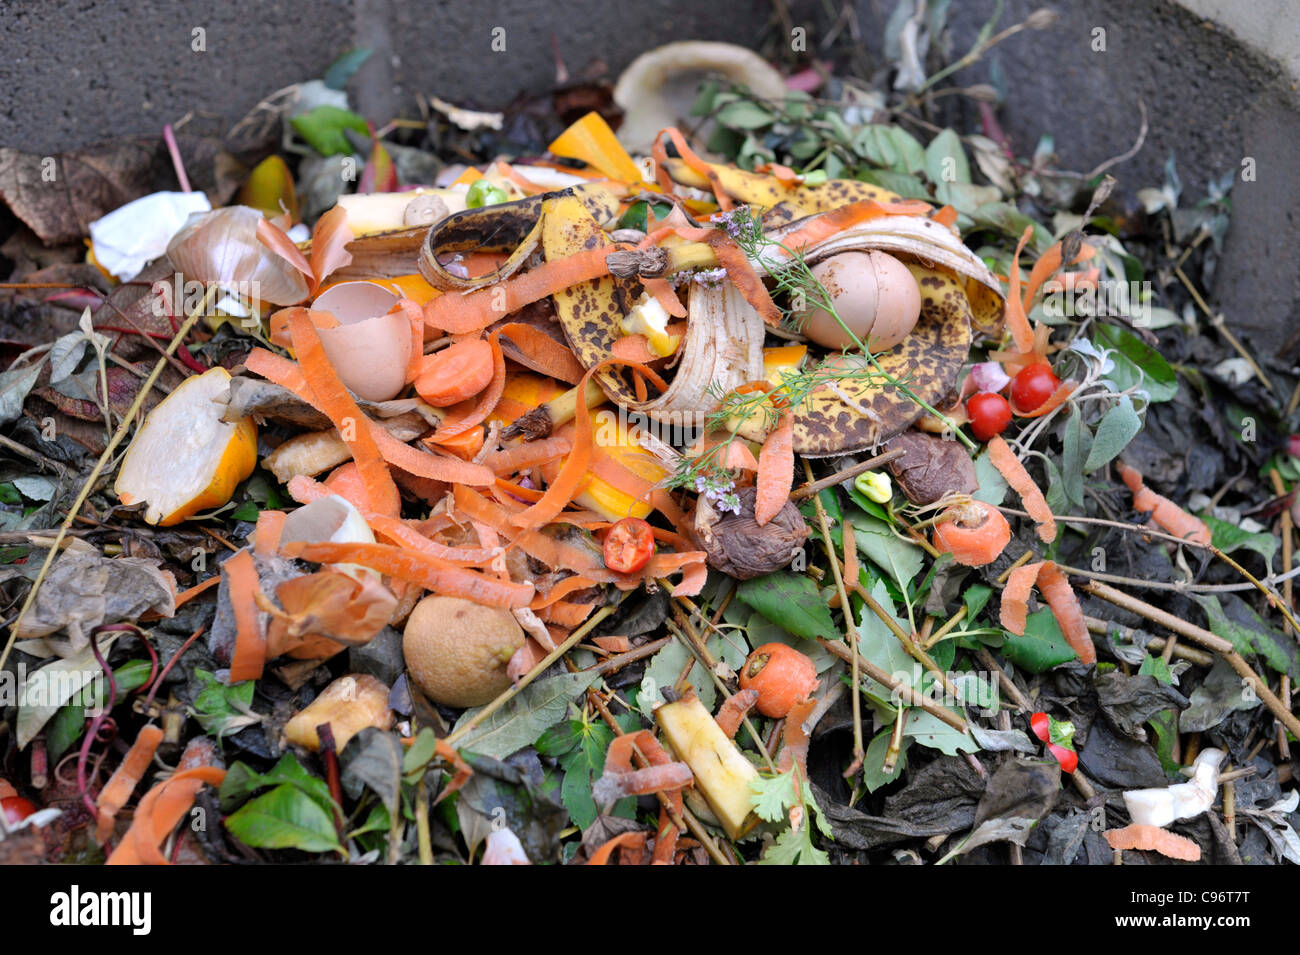 Food Compost Bin For Kitchen